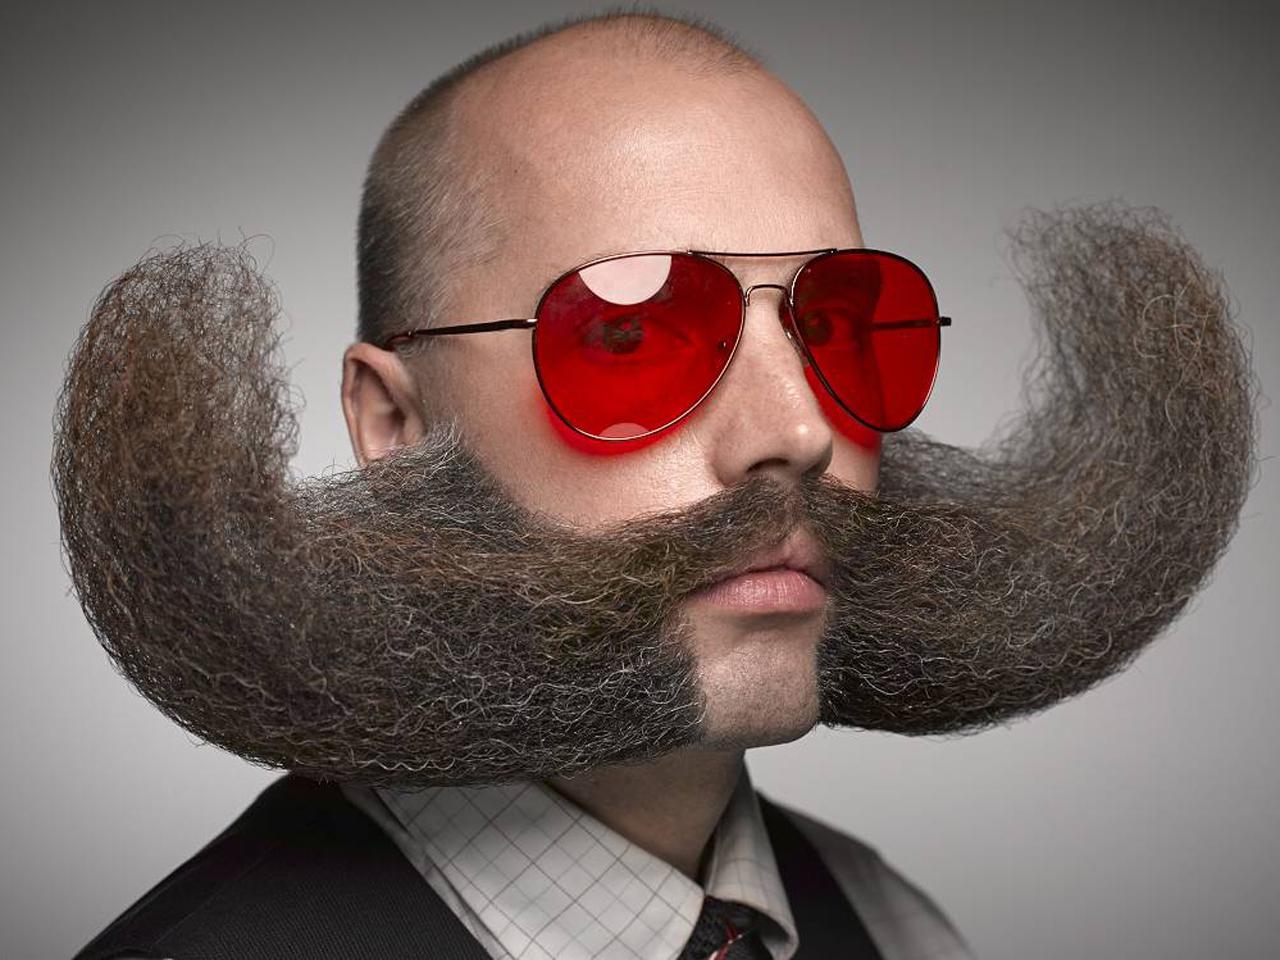 T3h super mustache